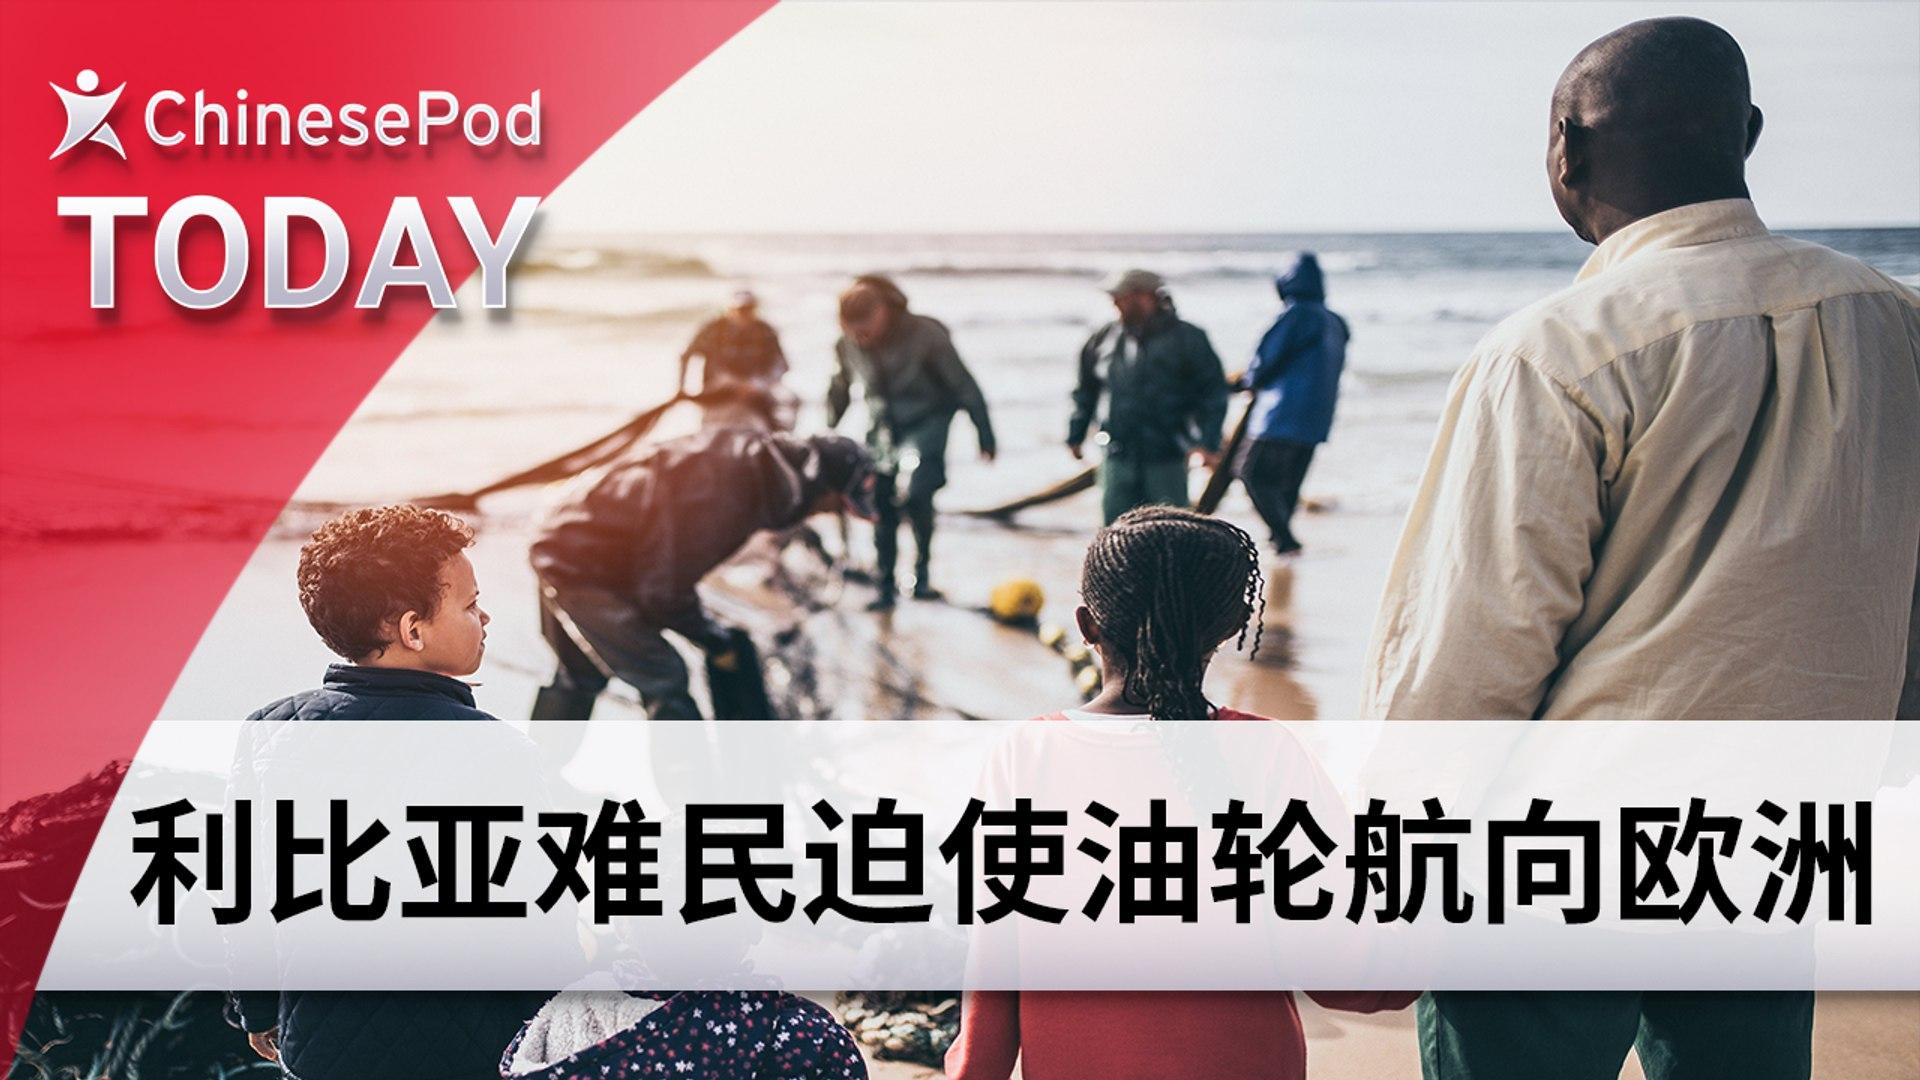 ChinesePod Today: Libyan Migrants Hijack Oil Tanker (simp. characters)